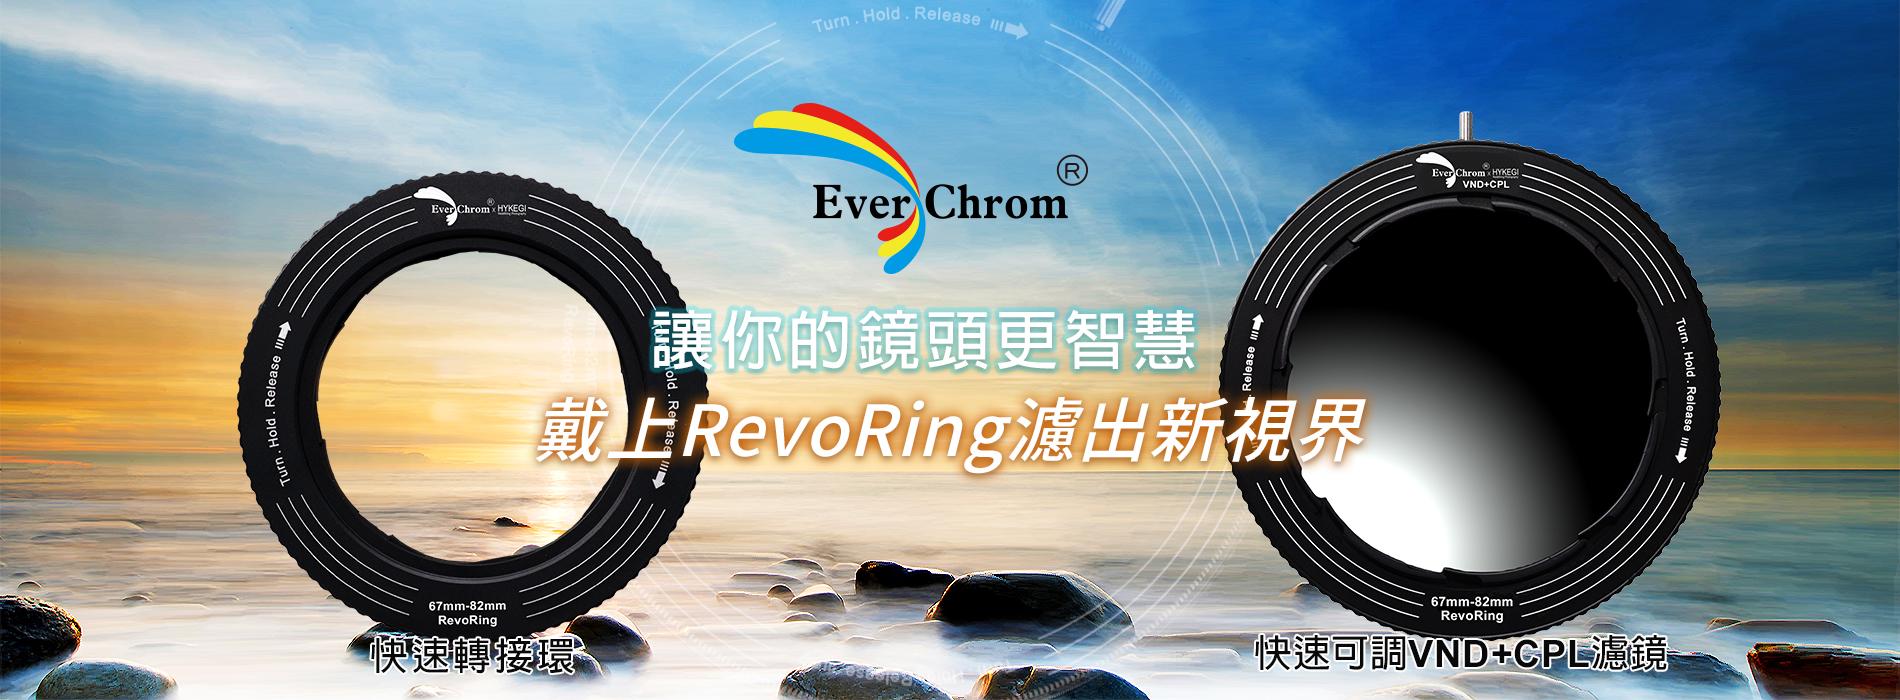 FB封面_RevoRing-1900X700-20210108